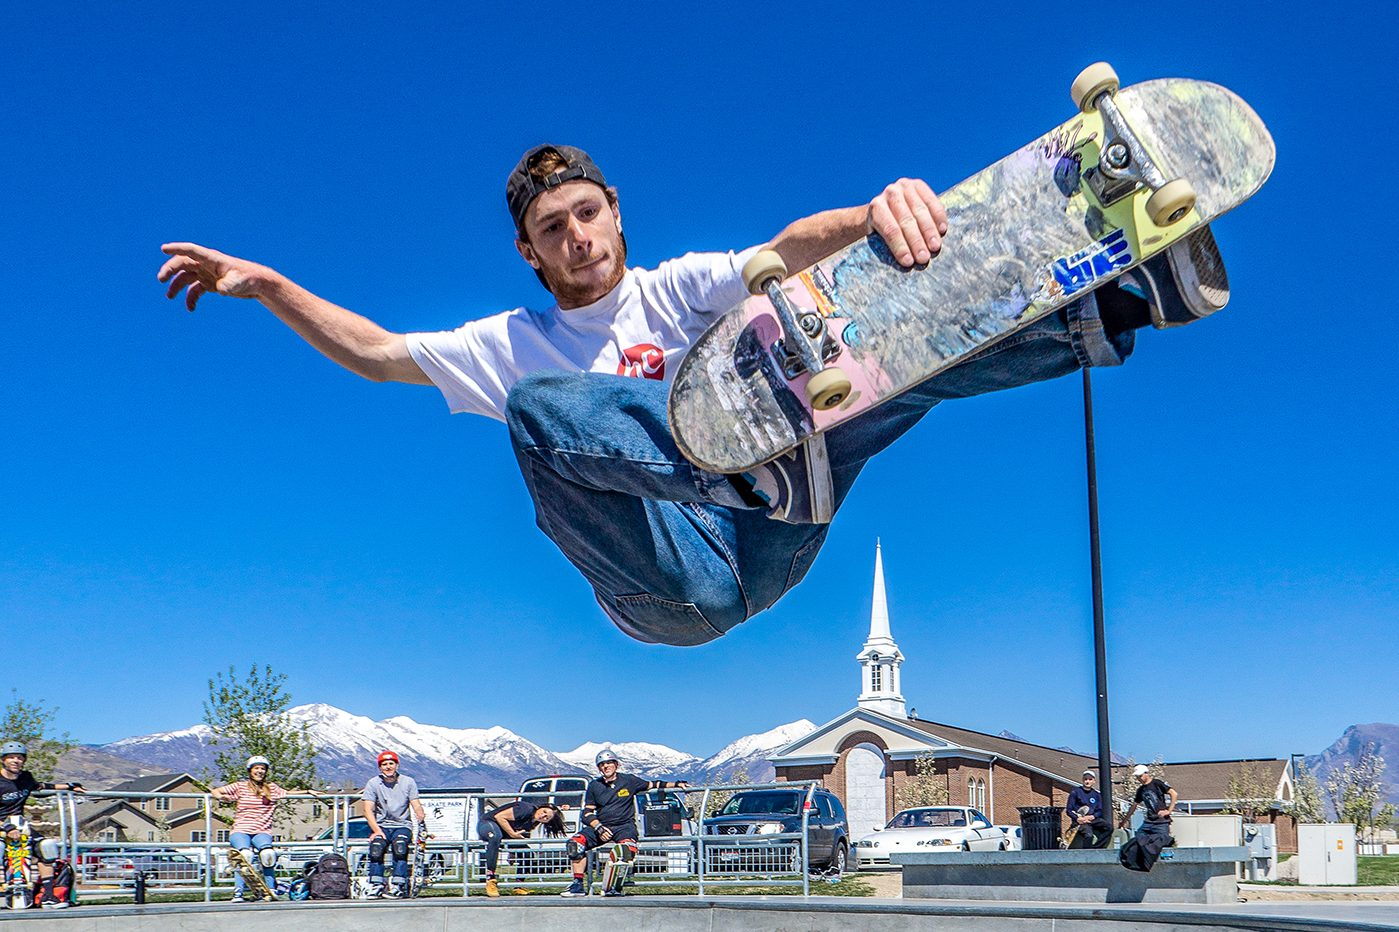 Kaleb Hadlock – Frontside Air – SLC, Utah. Photo: @randyjphoto